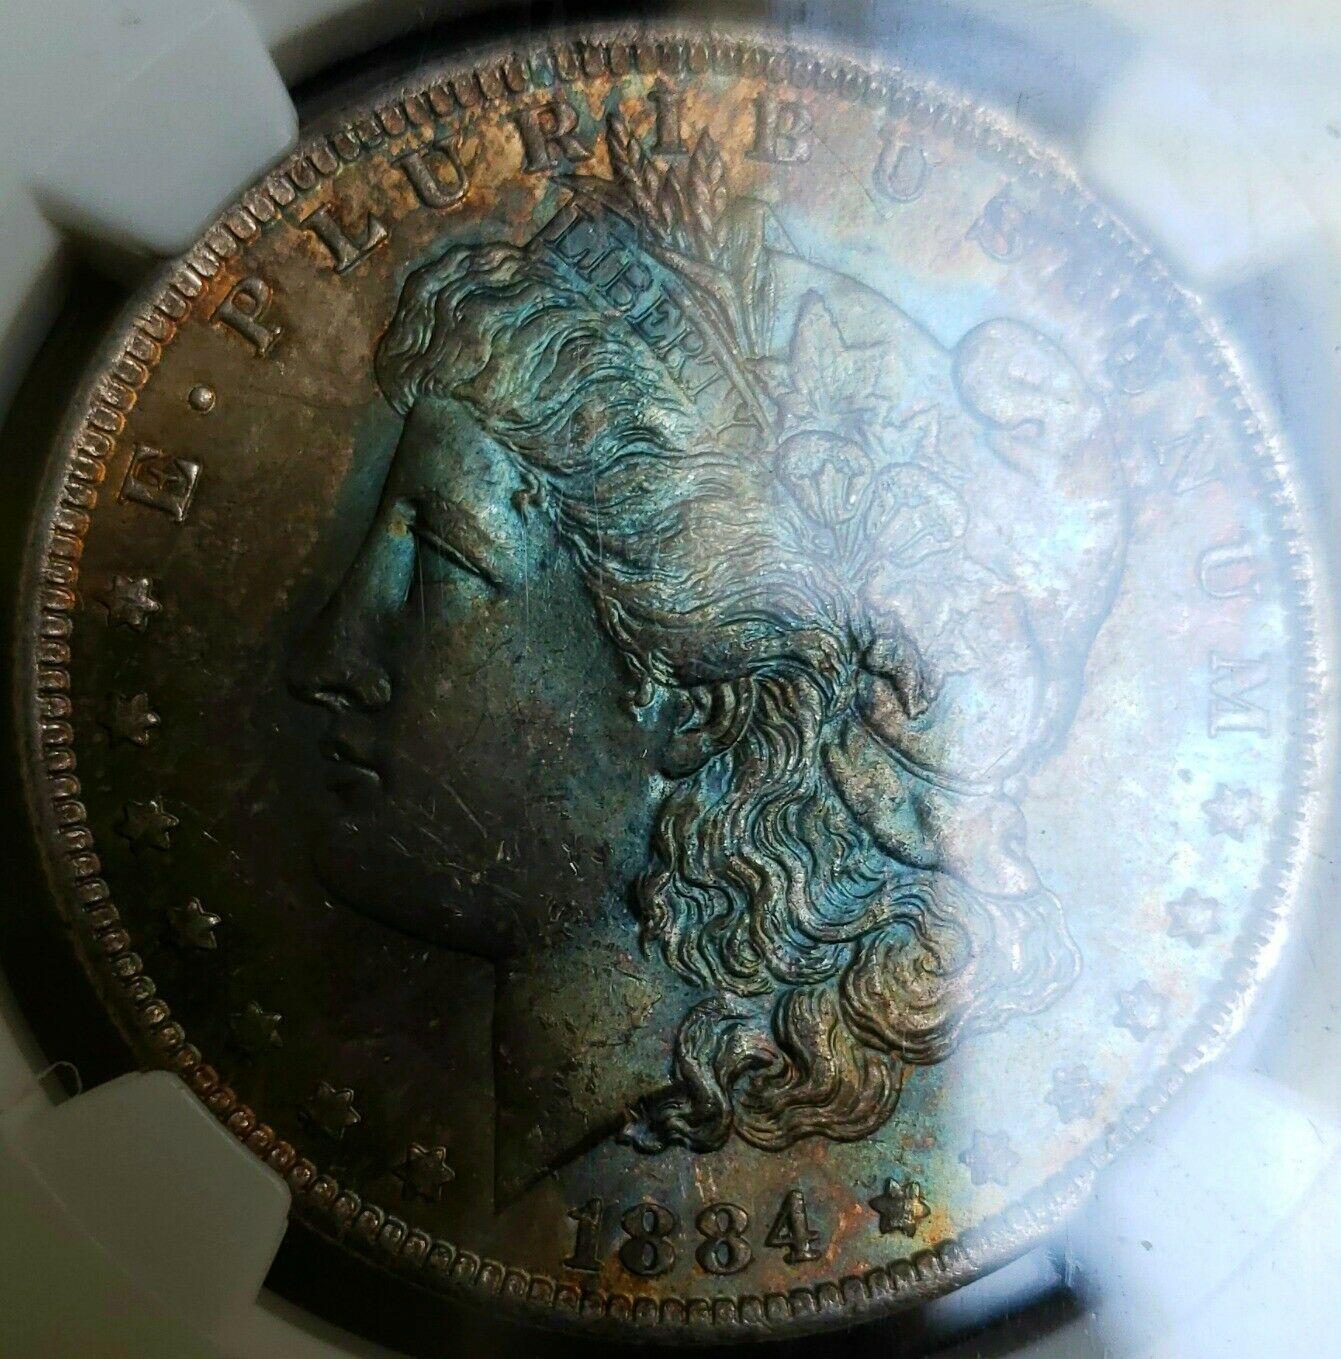 ~☆RAINBOW☆~ 1884-O MS-63 Morgan Silver Dollar NGC GORGEOUS COIN! AQUA BLUES